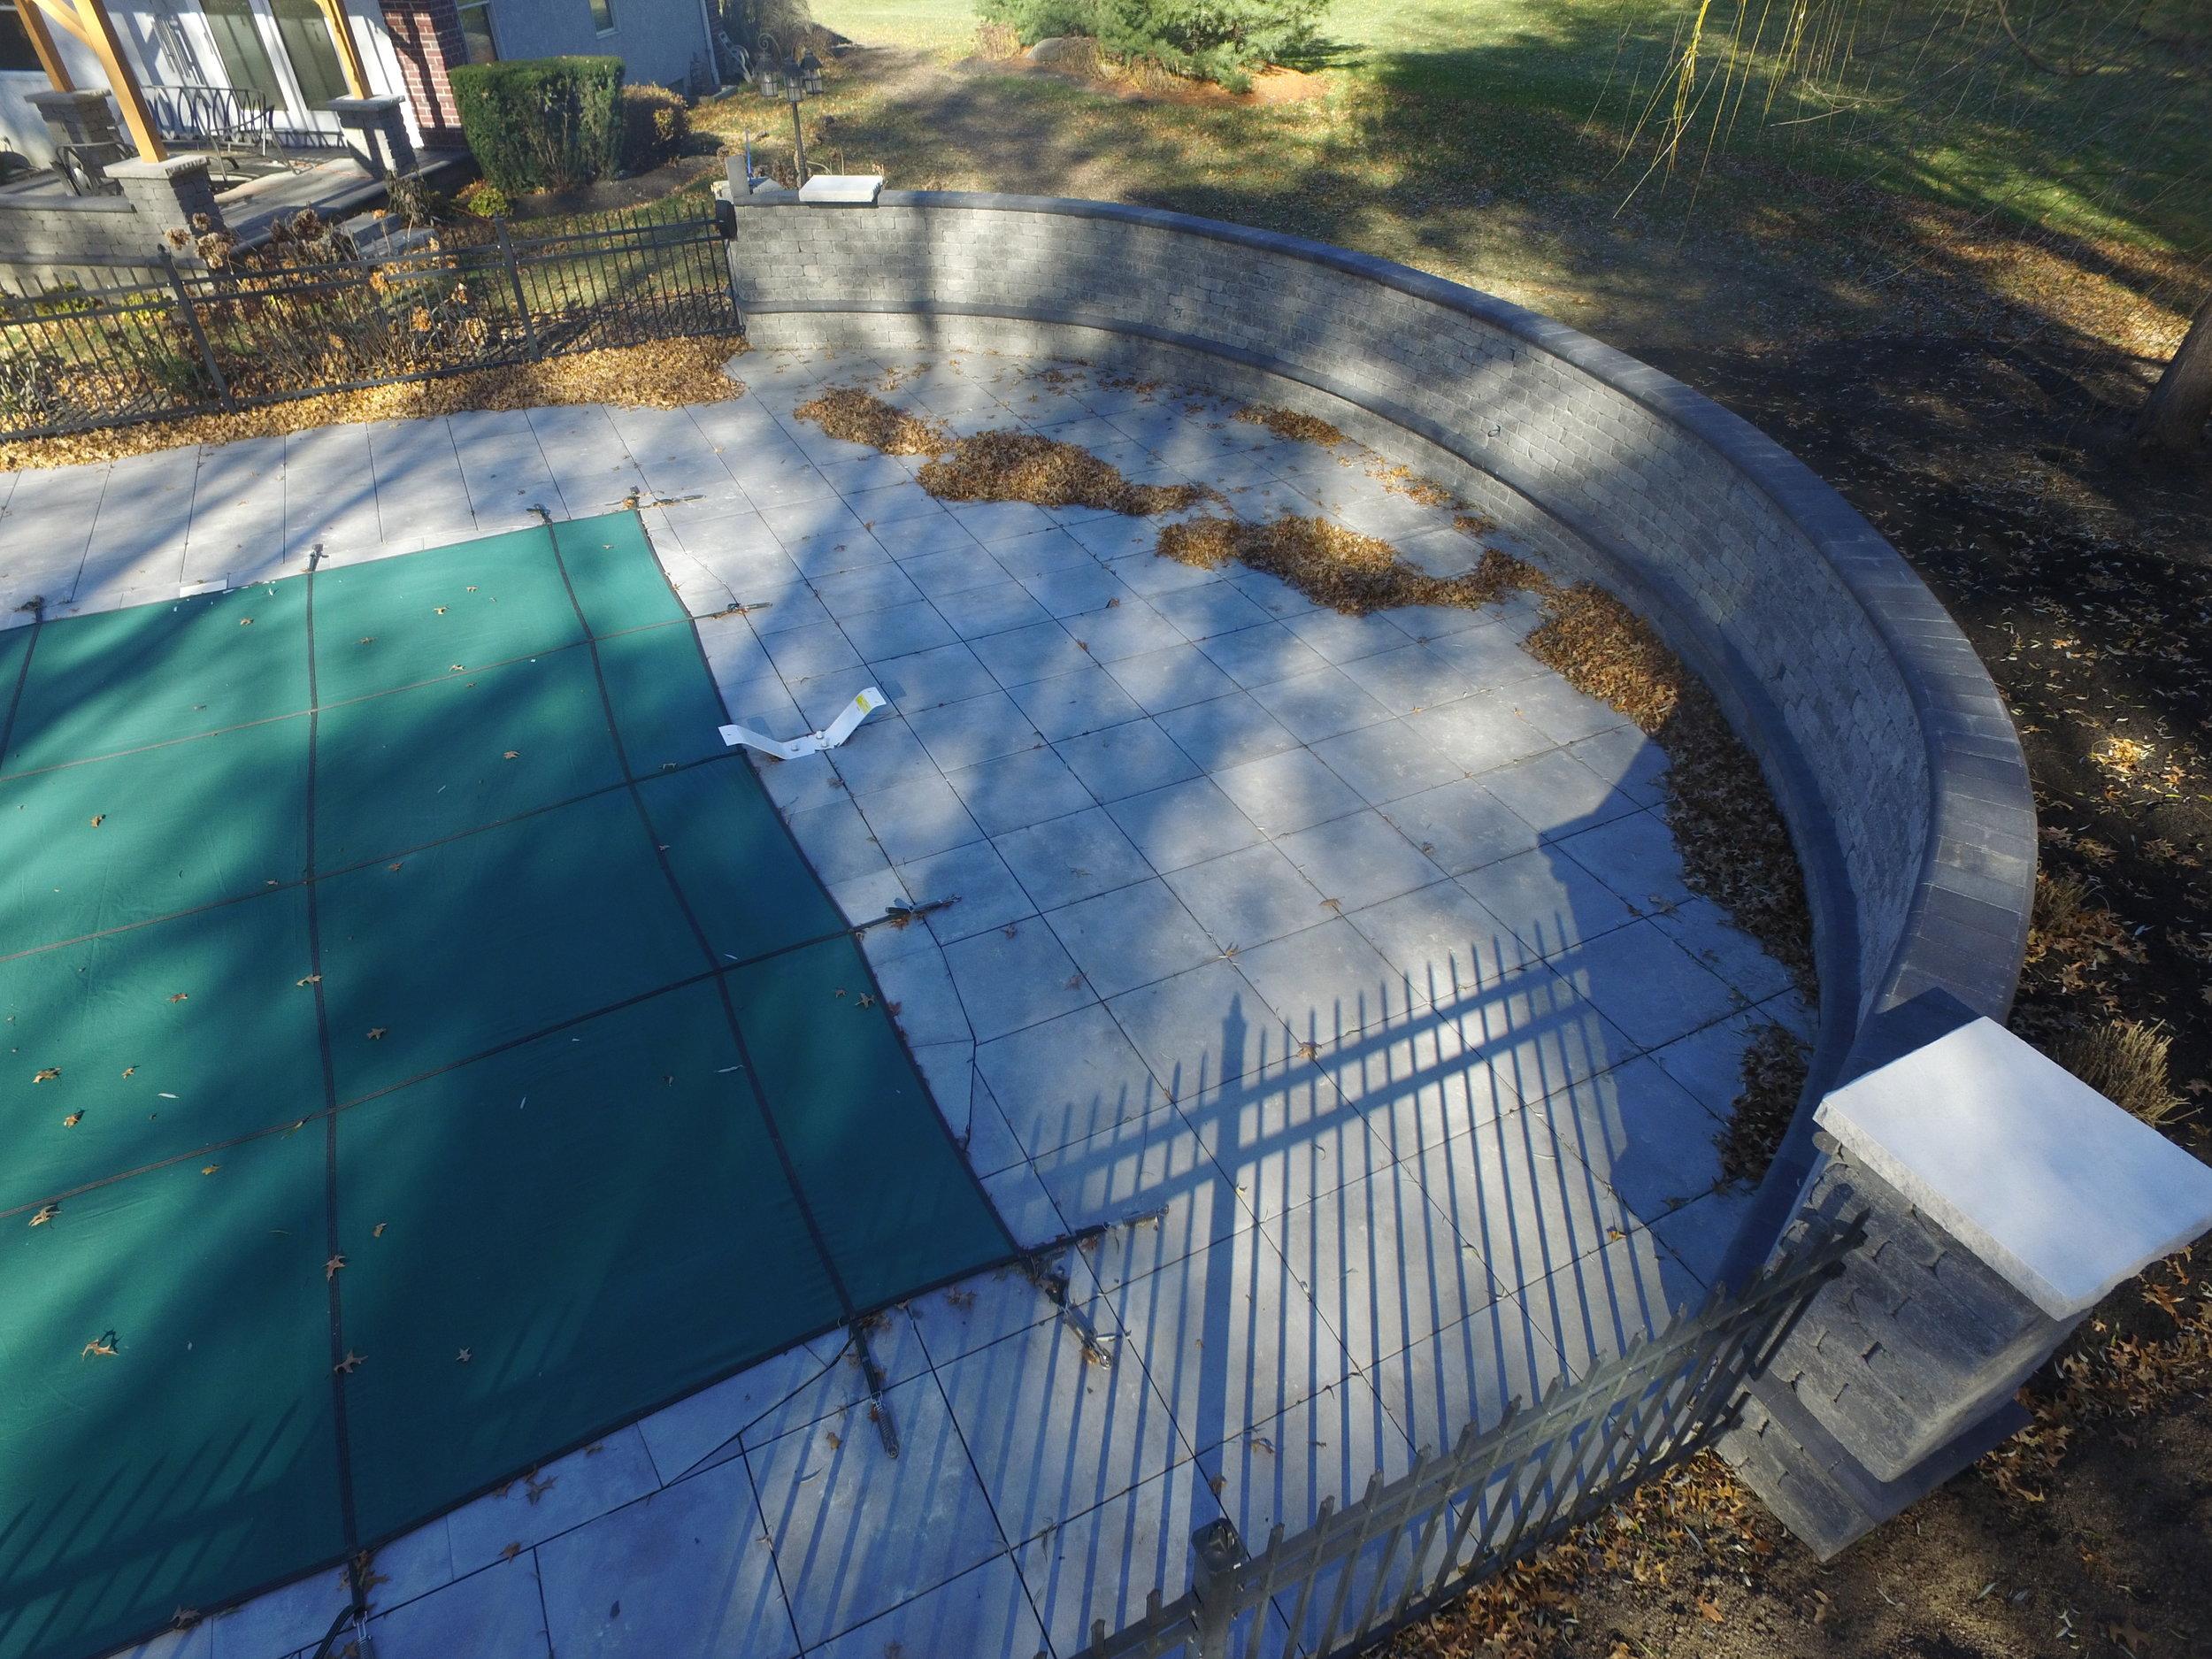 Stranges Pool Wall